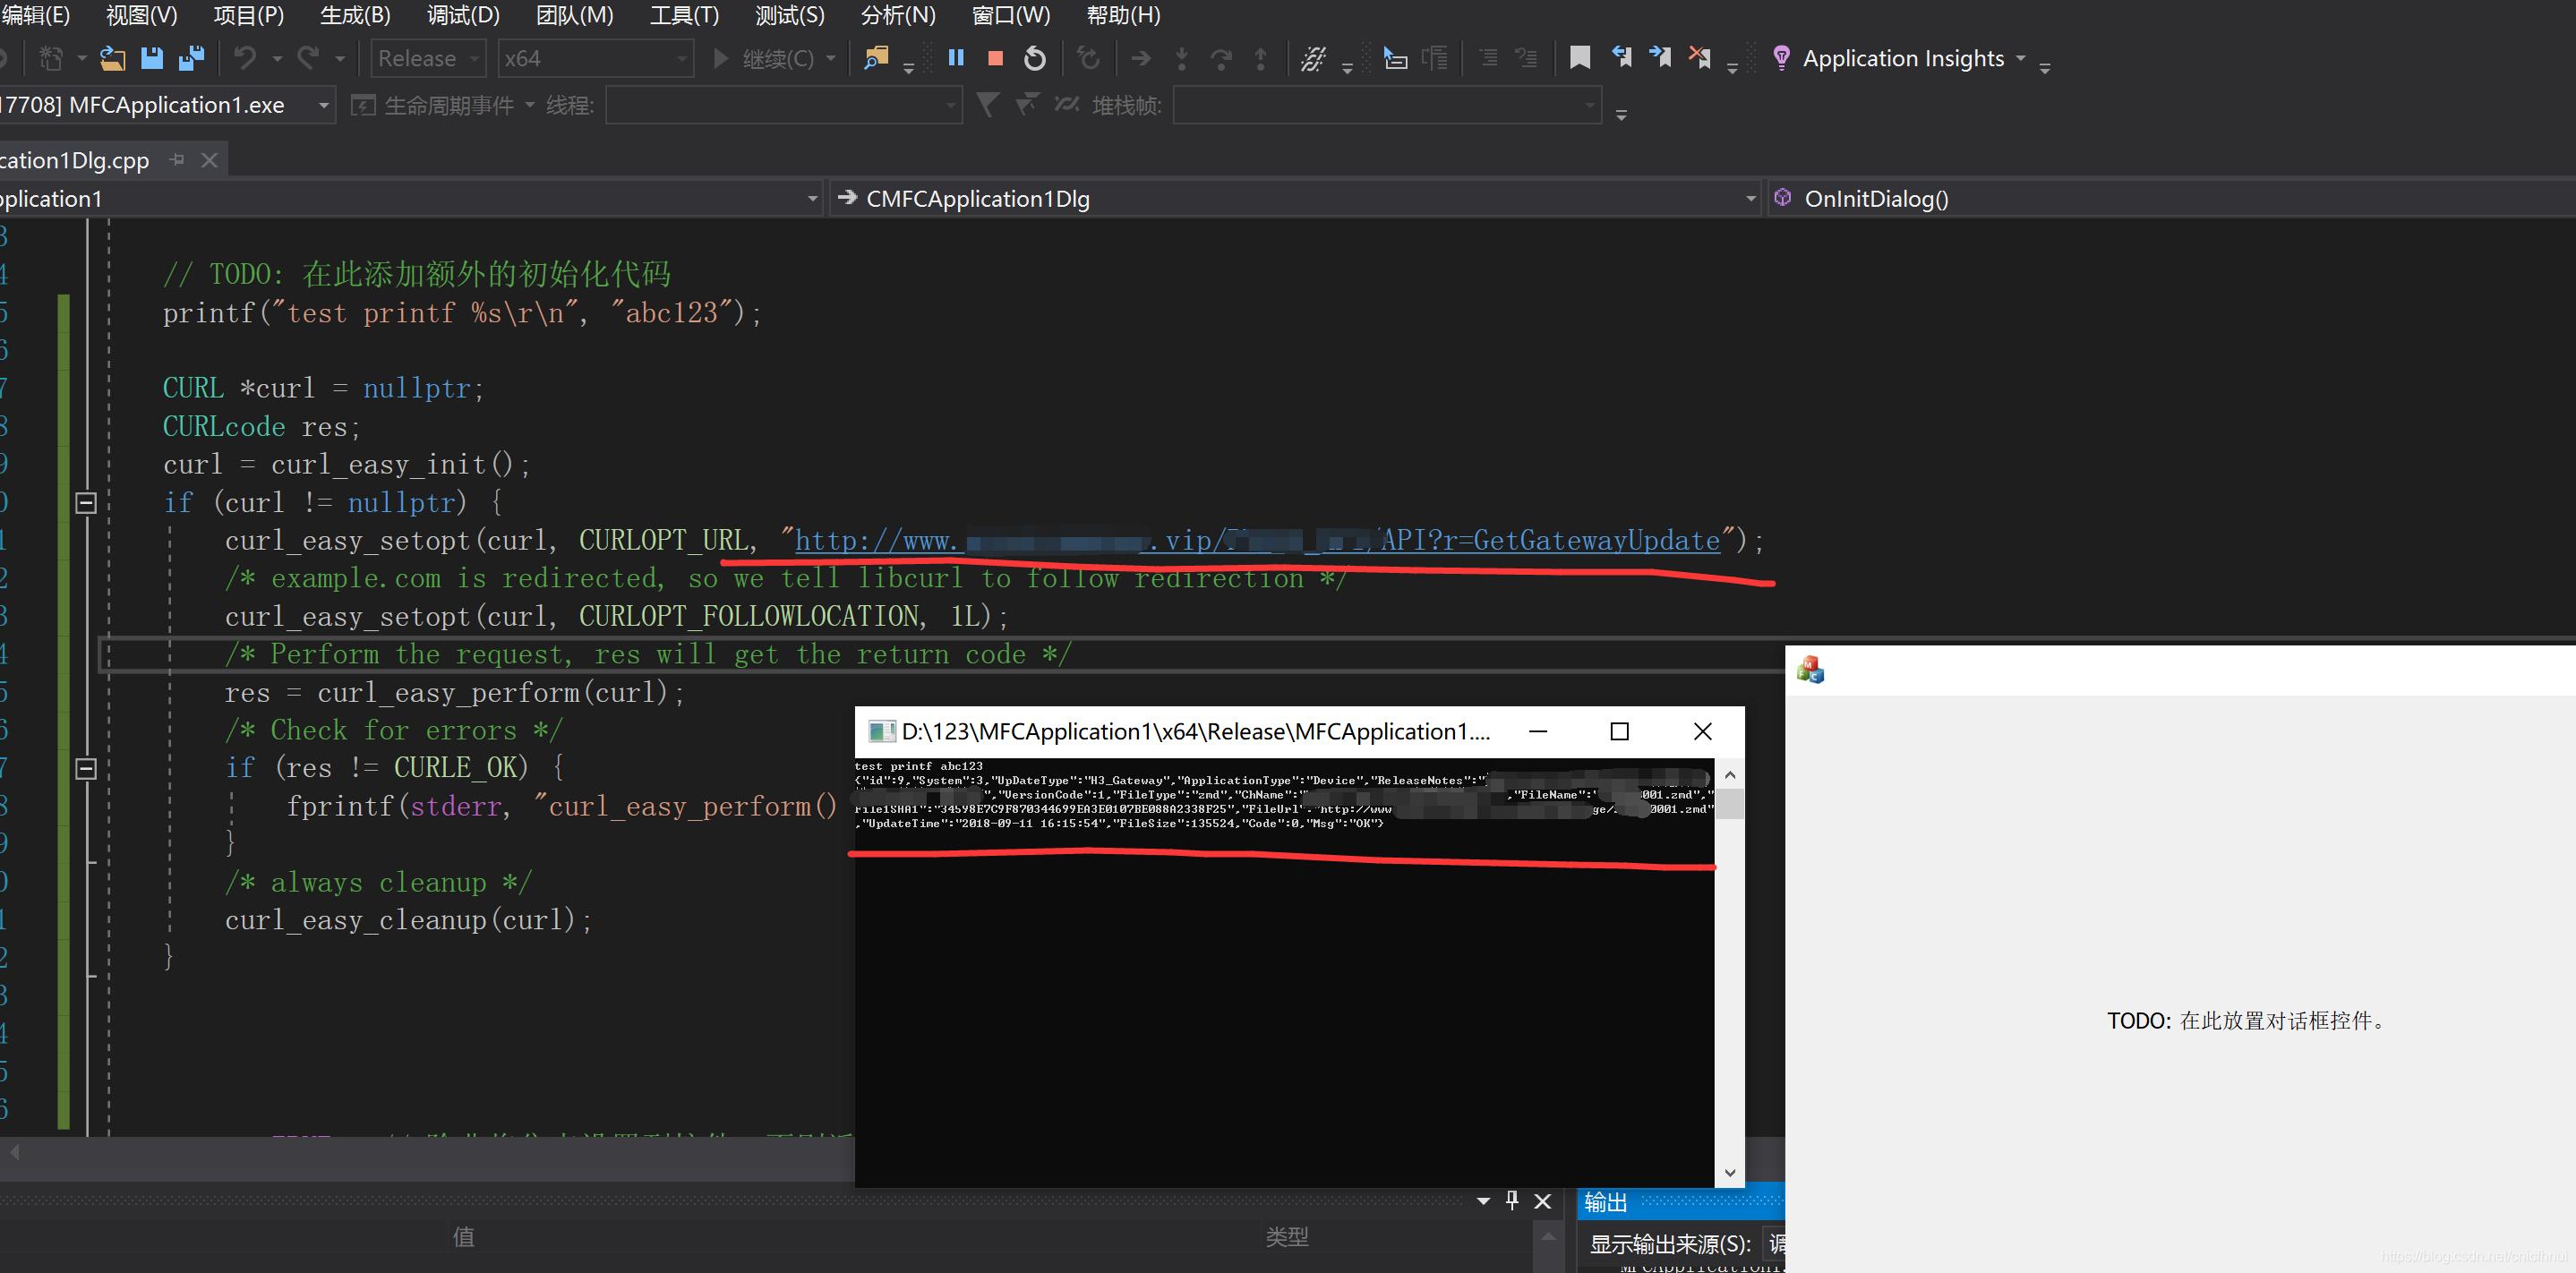 Visual Studio(VS2017)编译并使用curl C/C++ HTTP GET POST libcurl(二、调用示例)cnicfhnui的博客-vs2017如何编译并运行curl